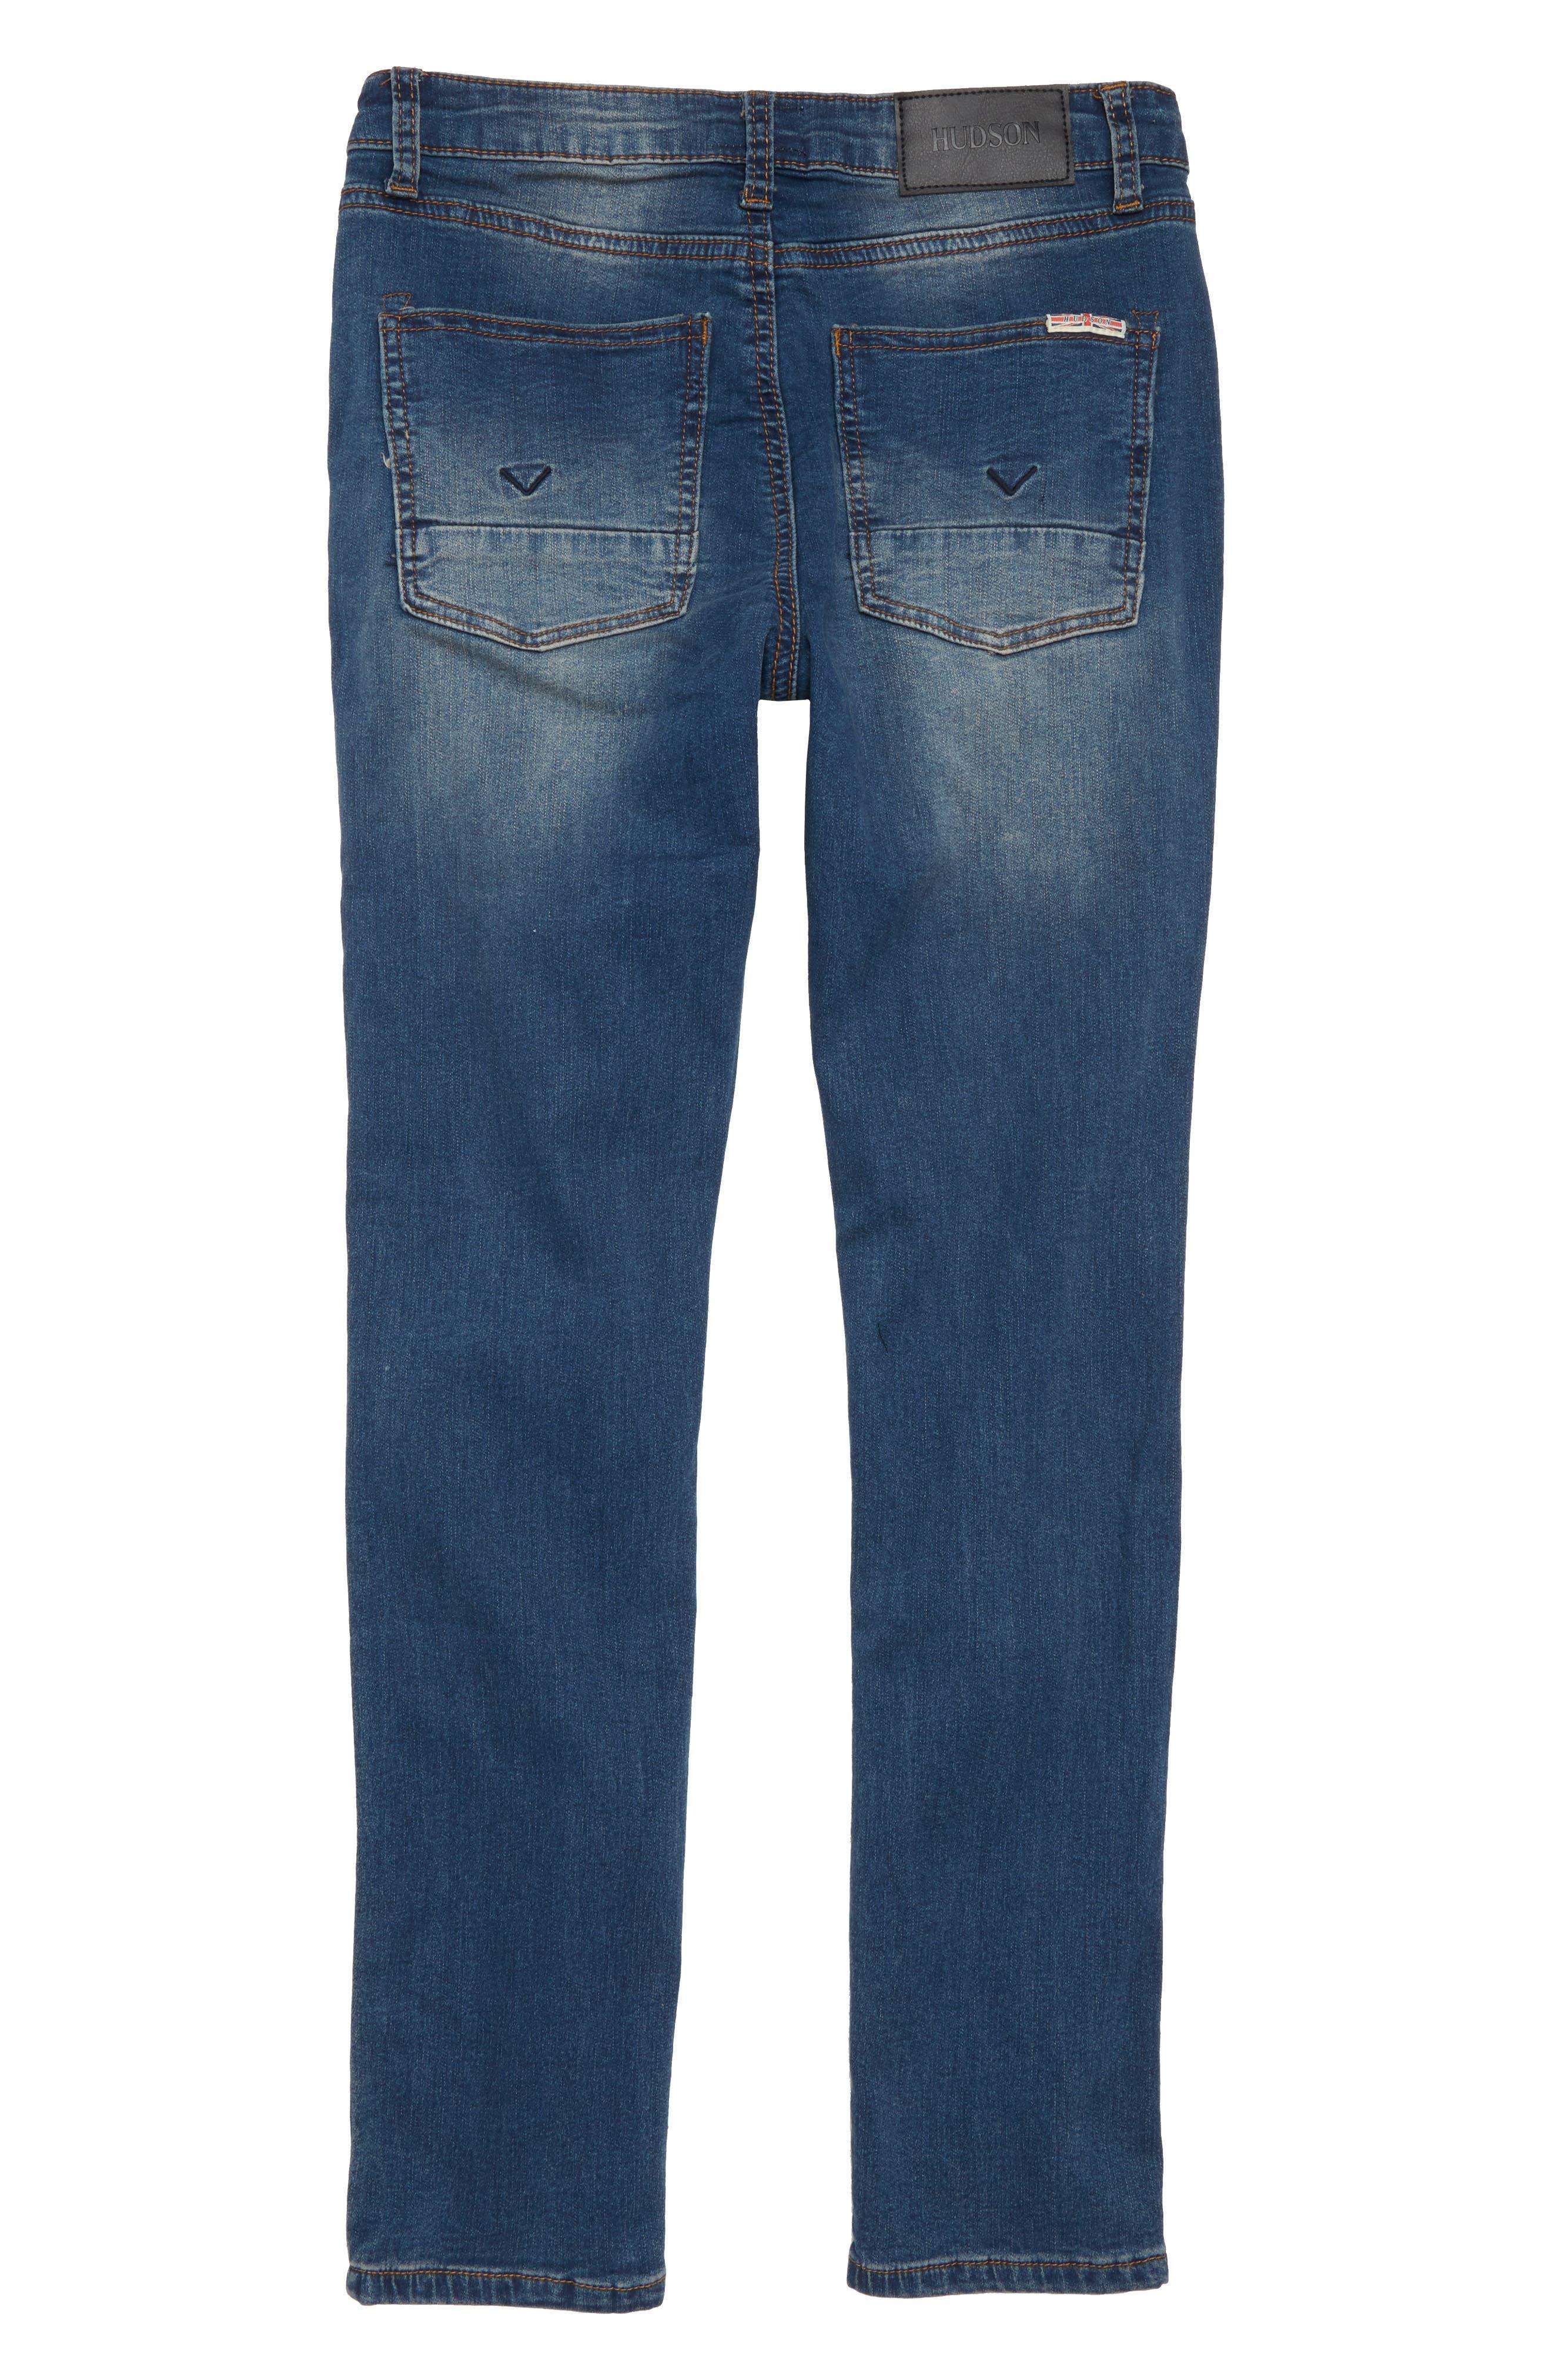 Jagger Slim Fit Straight Leg Jeans,                             Alternate thumbnail 2, color,                             Beaten Blue